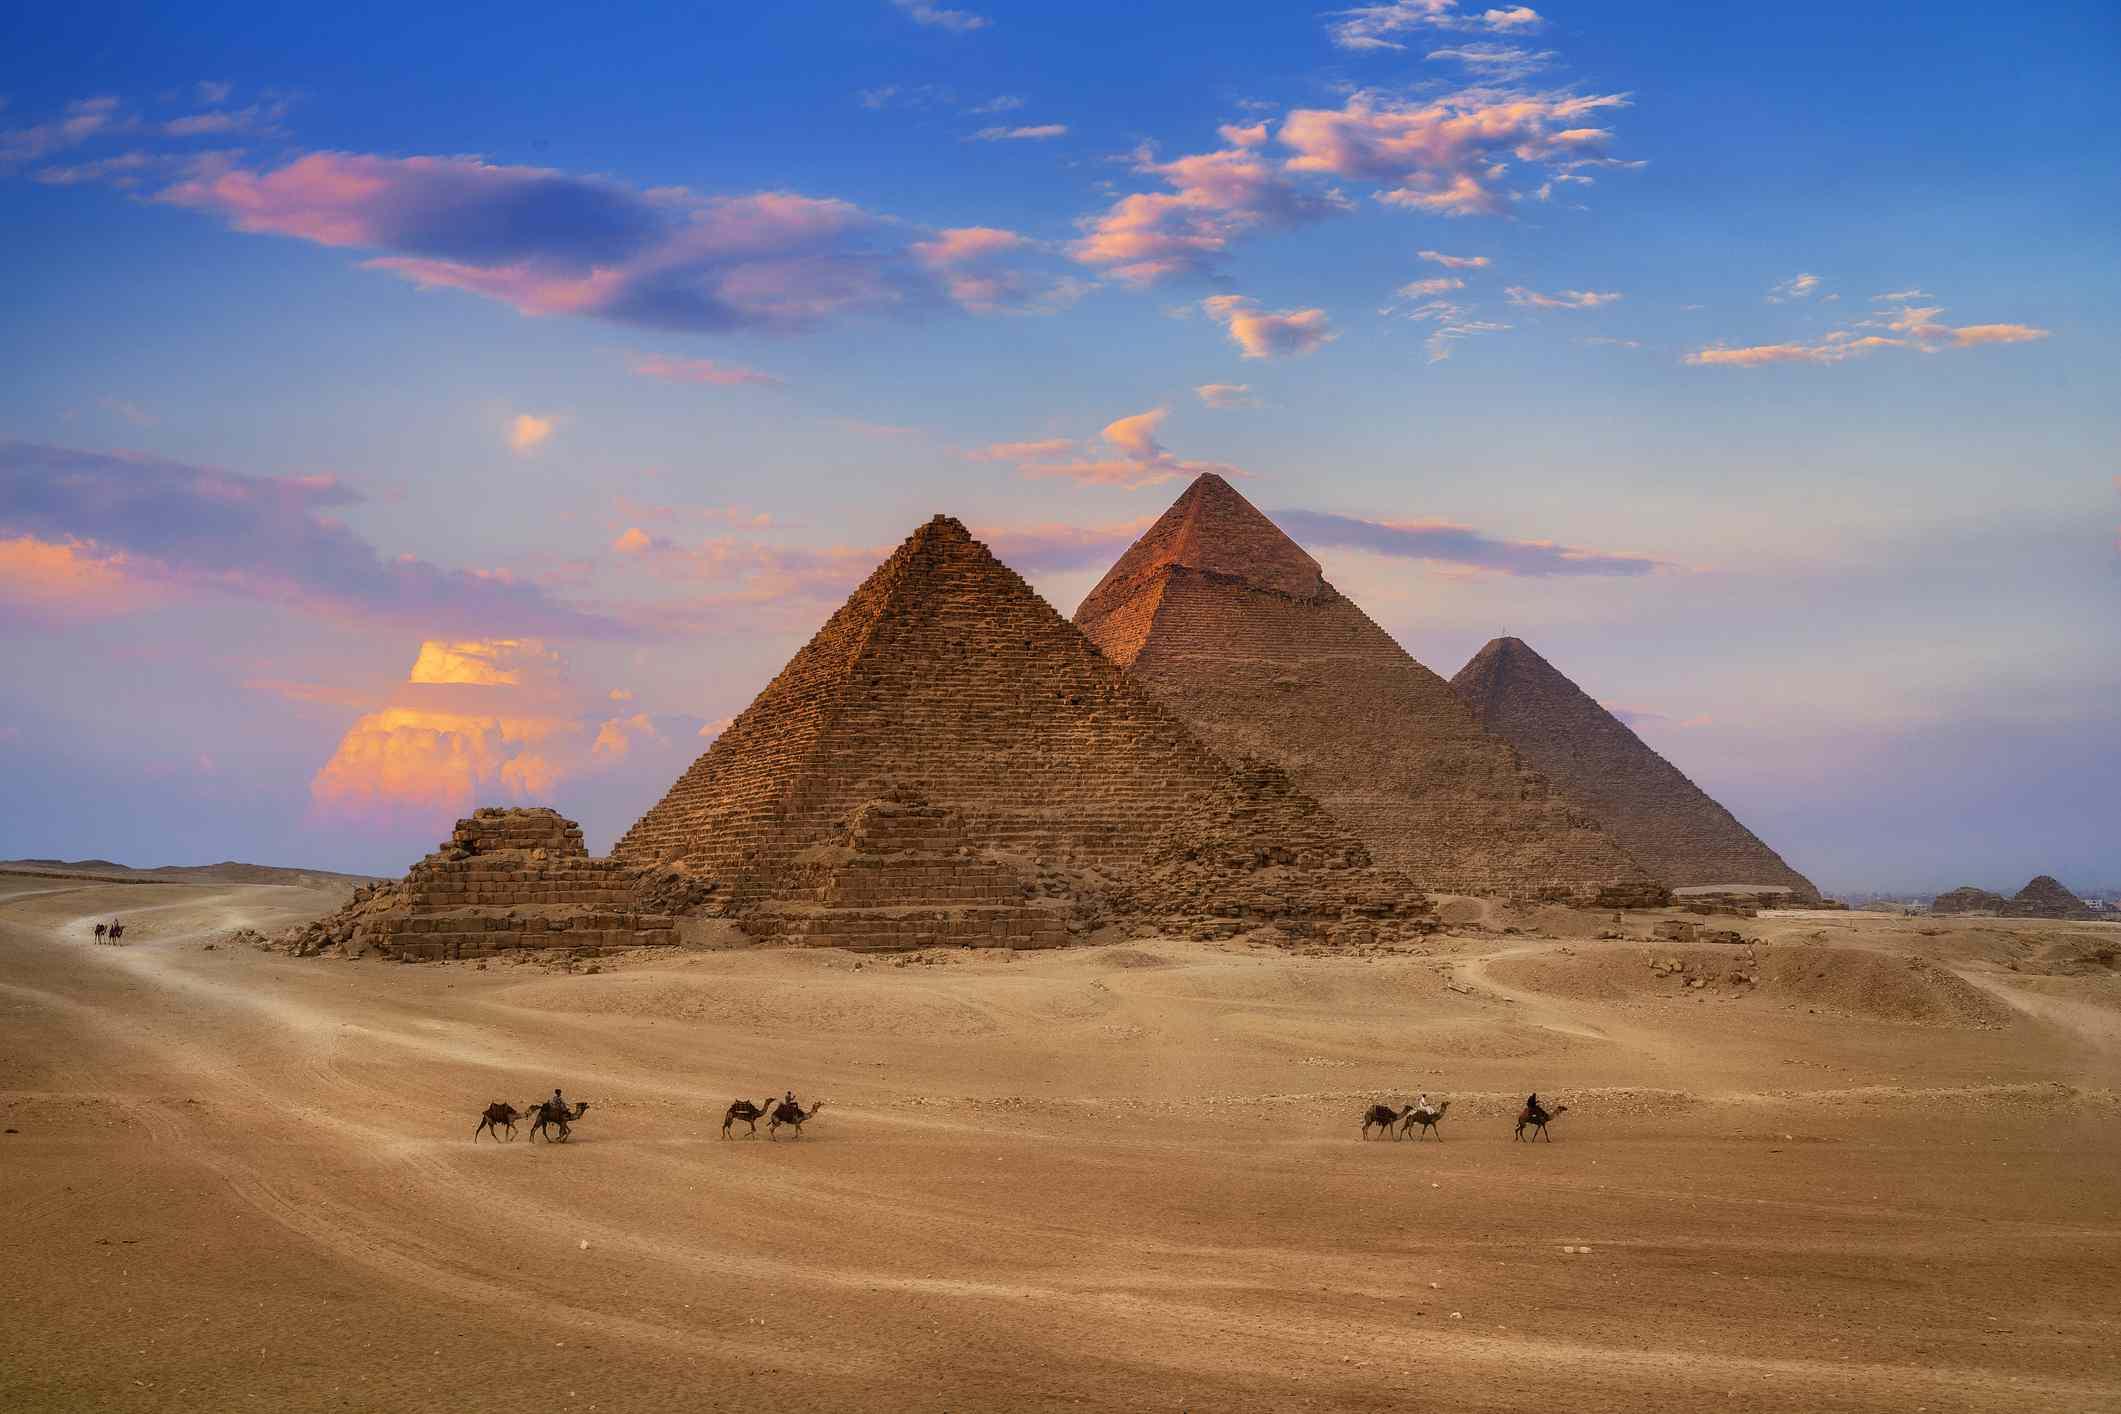 Giza Egypt Pyramids in Sunset Scene, Wonders of the World.